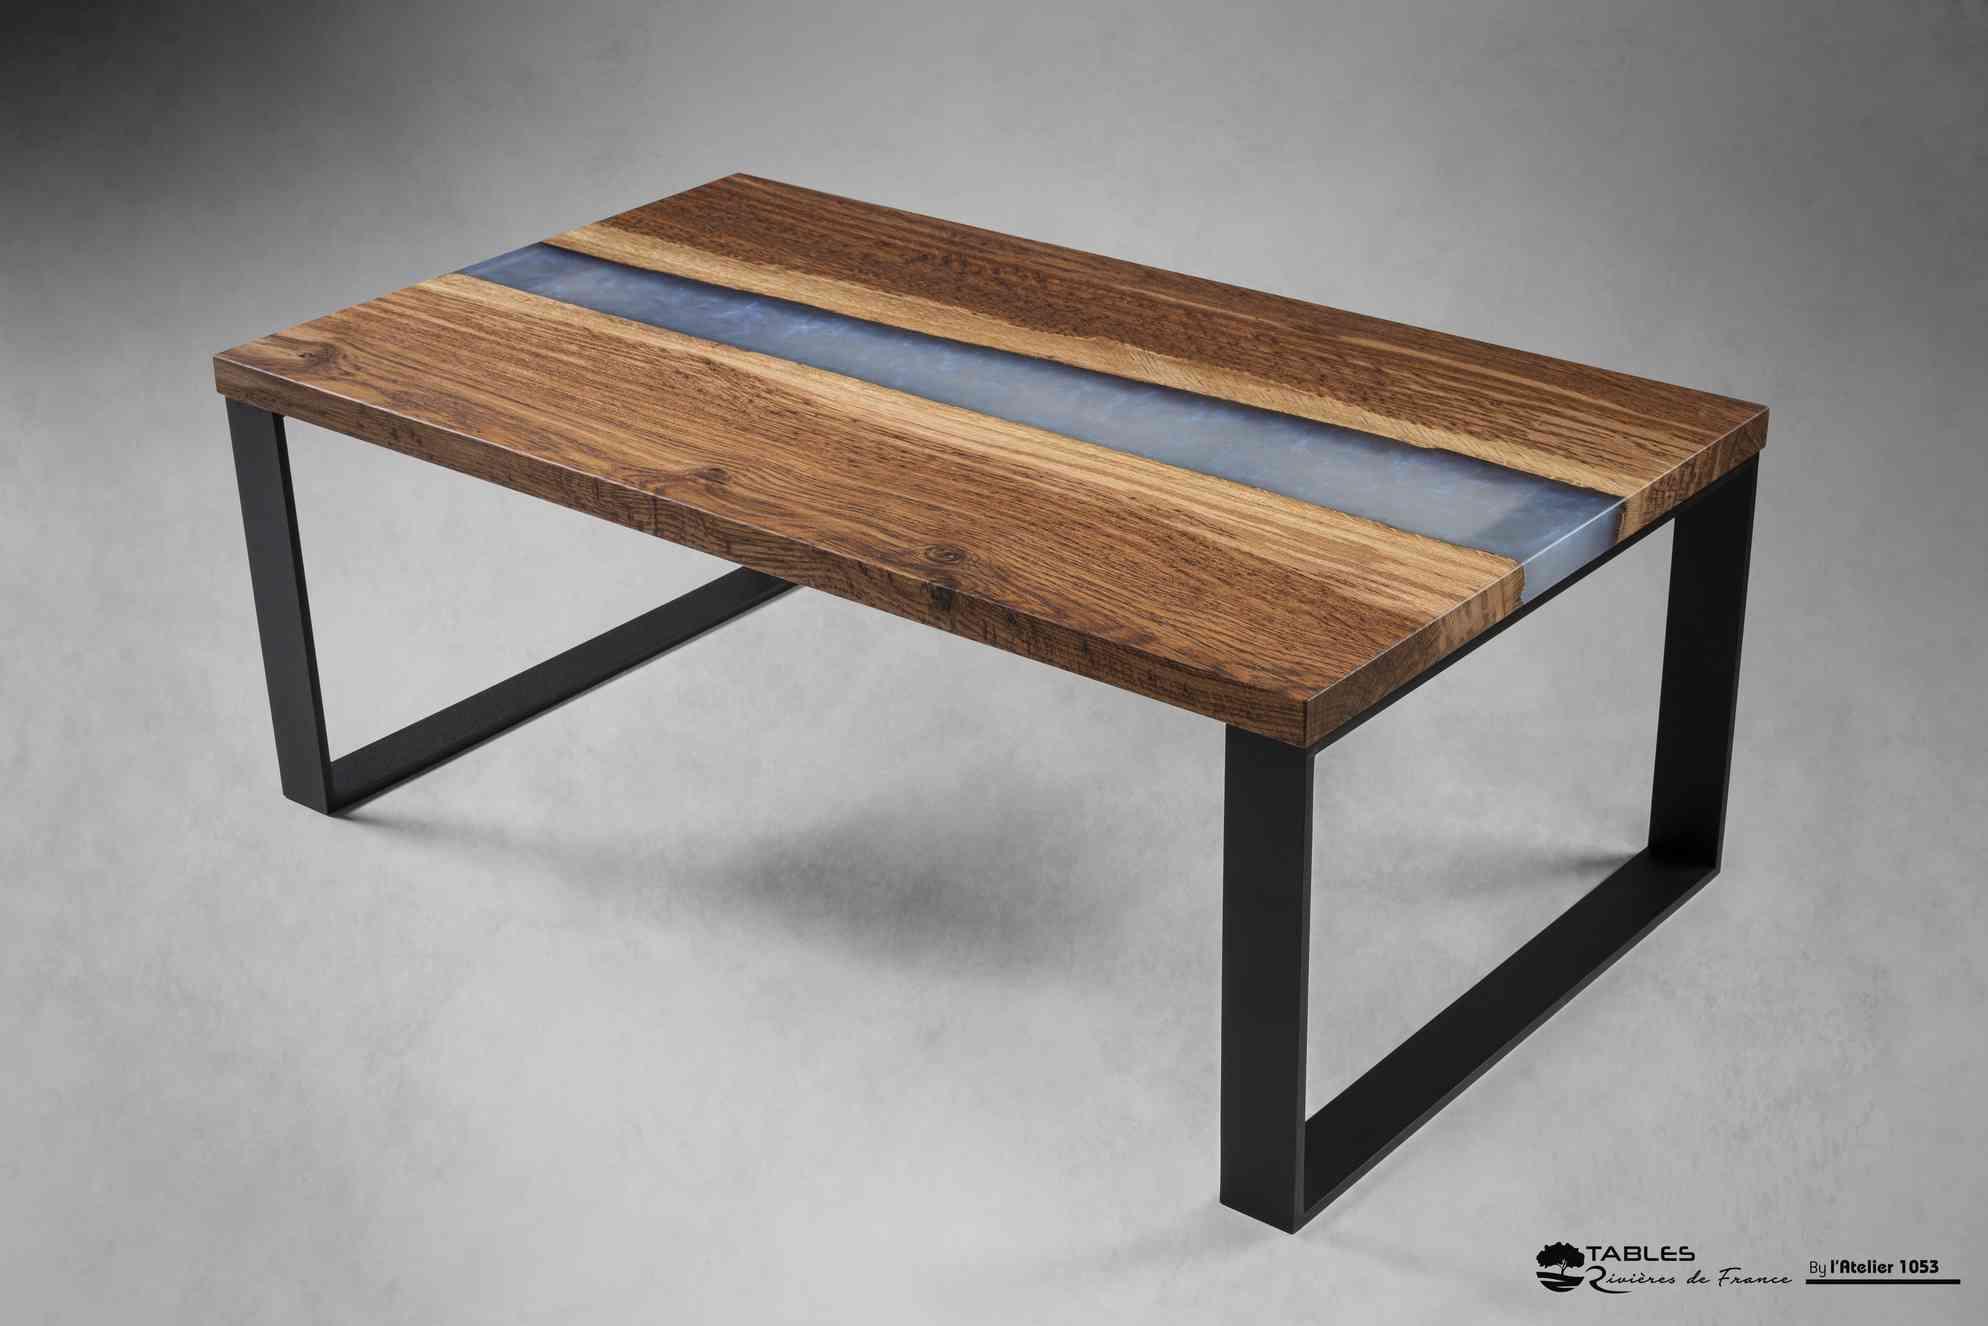 Table La Sarthe Atelier 1053